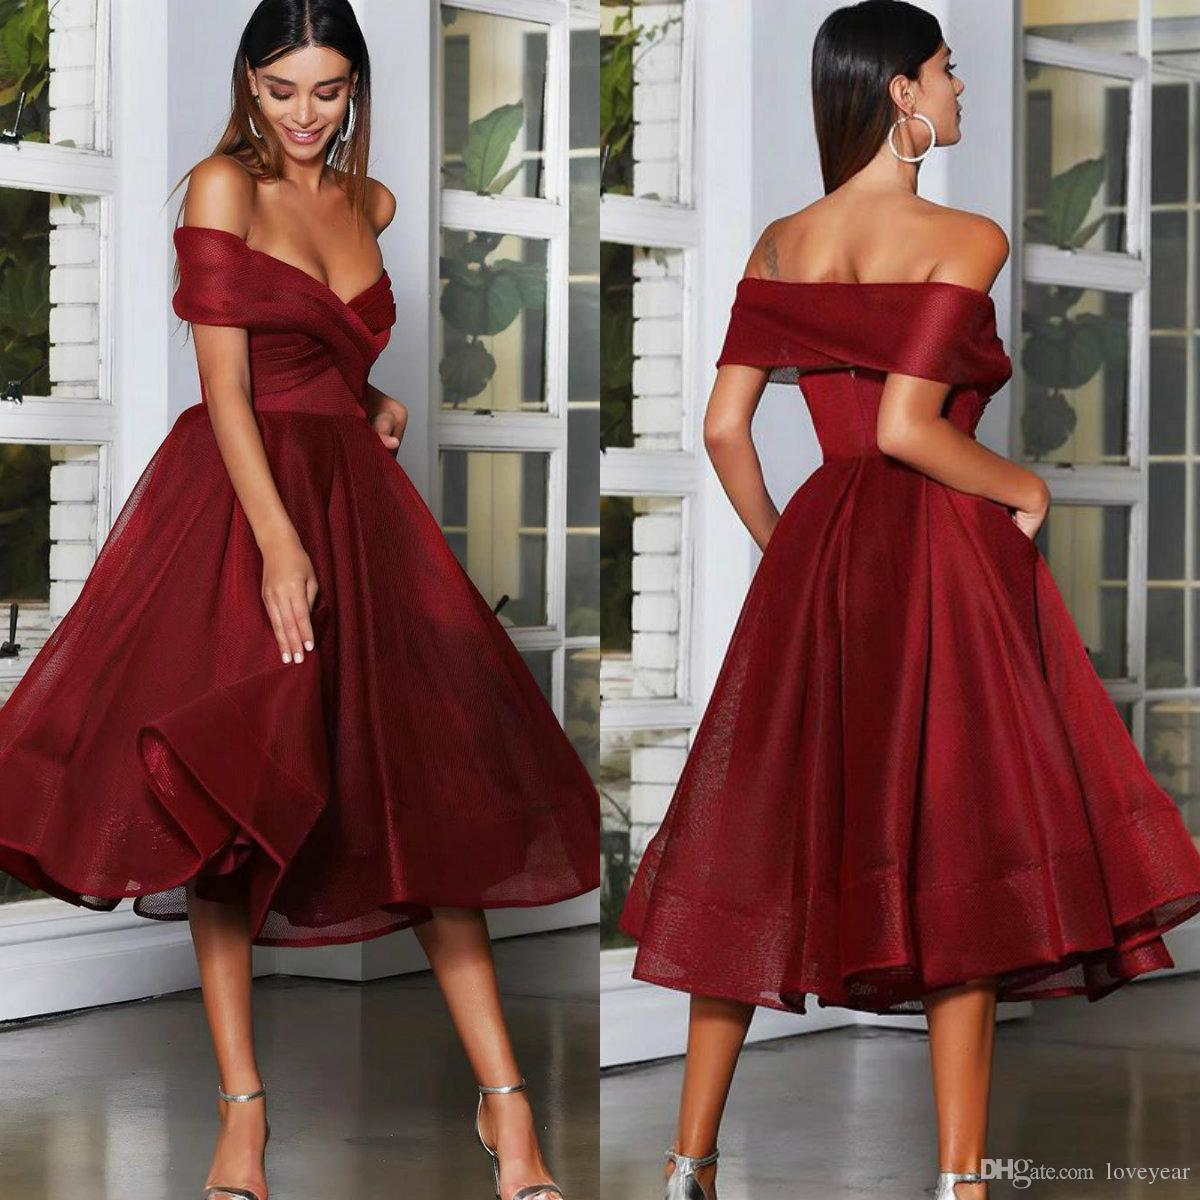 2020 Burgundy Short Prom Dresses Ruched Off the Shoulder A Line Evening Dress Vestidos Tea Length Cocktail Party Gowns